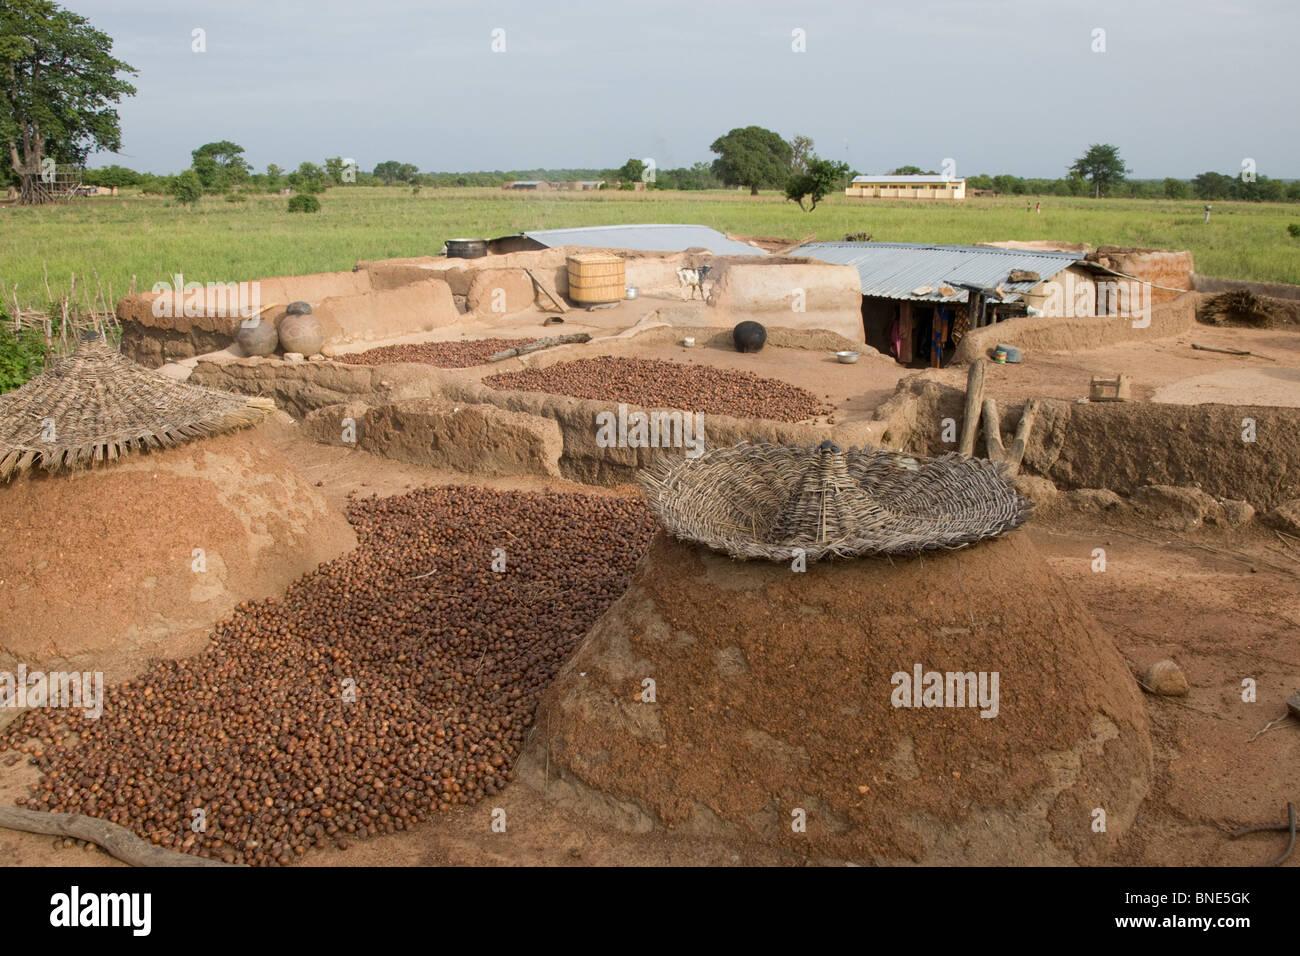 Rooftops of a Lobi compound used for food storage, Talawona, near Wechiau, Ghana. - Stock Image